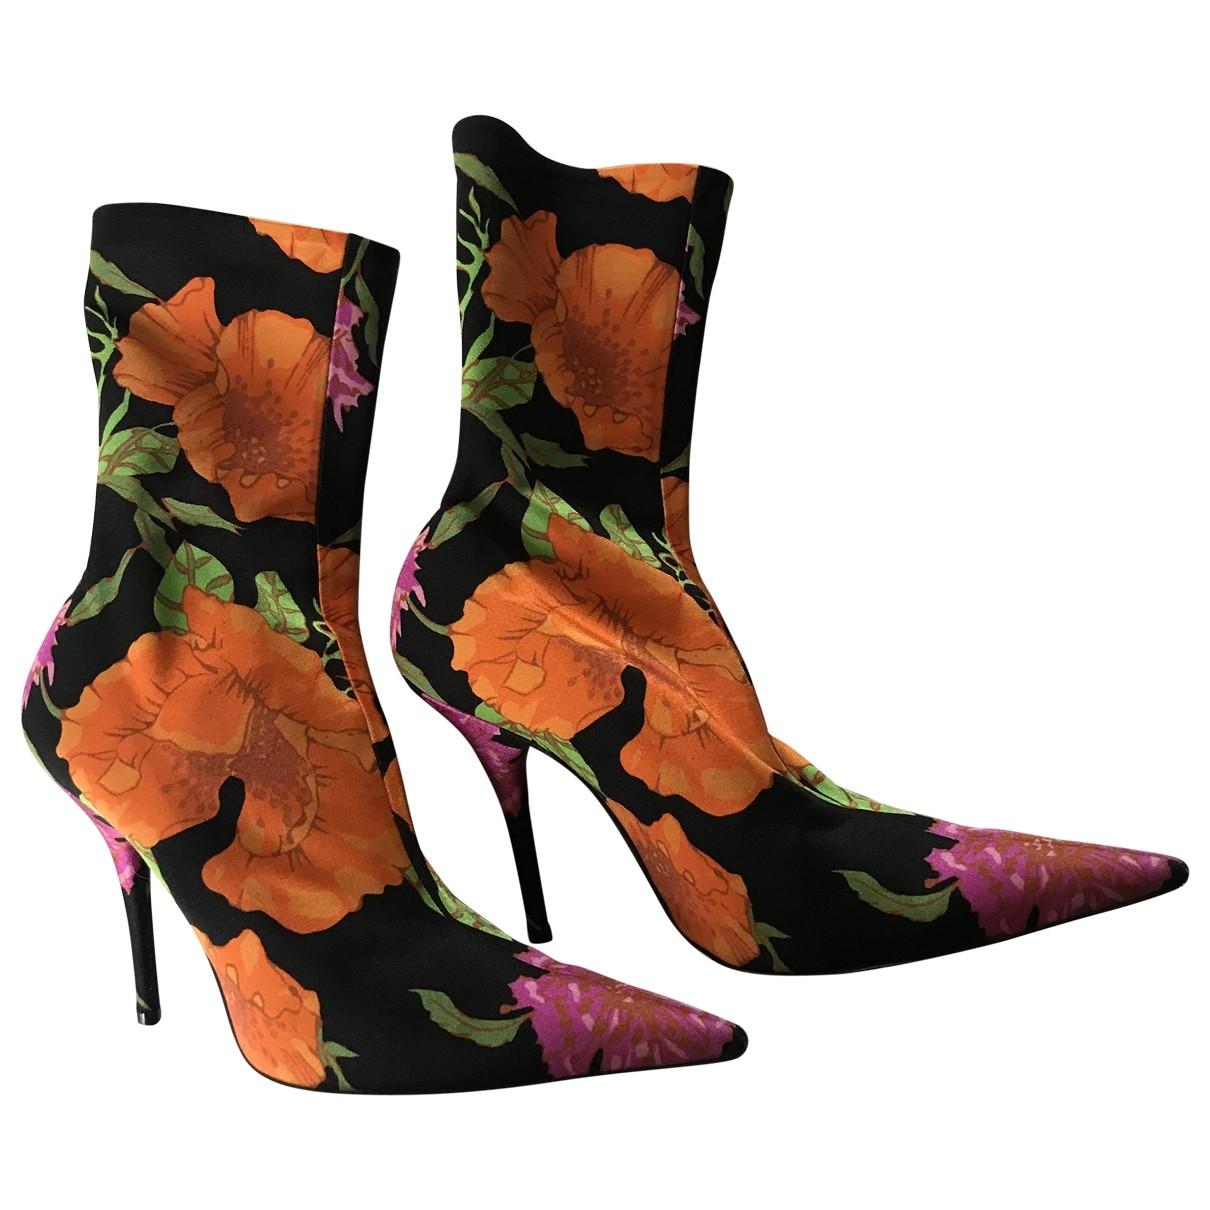 Balenciaga - Boots Knife pour femme en toile - multicolore